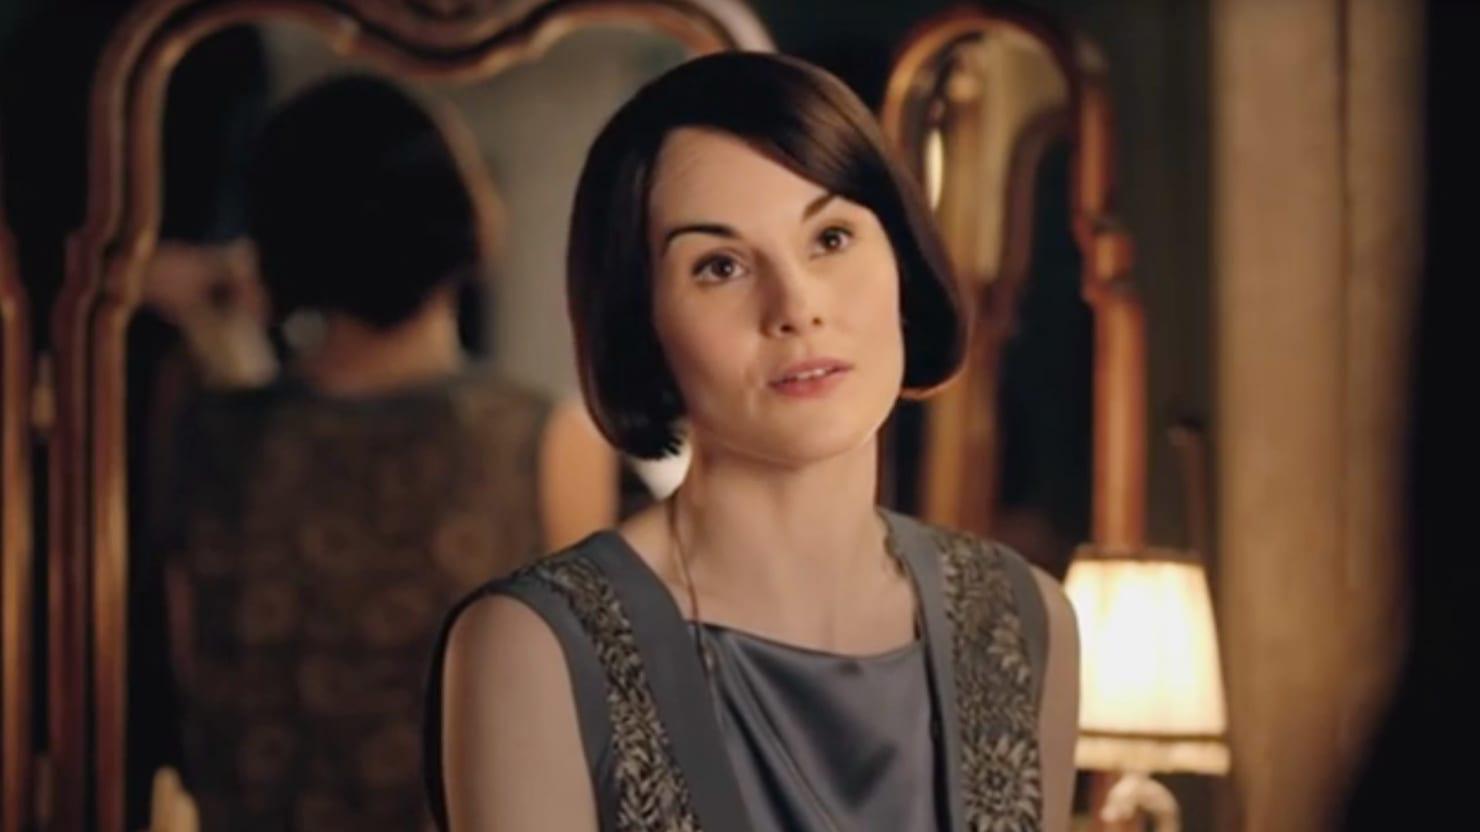 Downton Abbey's Final Season Trailer Will Make You Cry